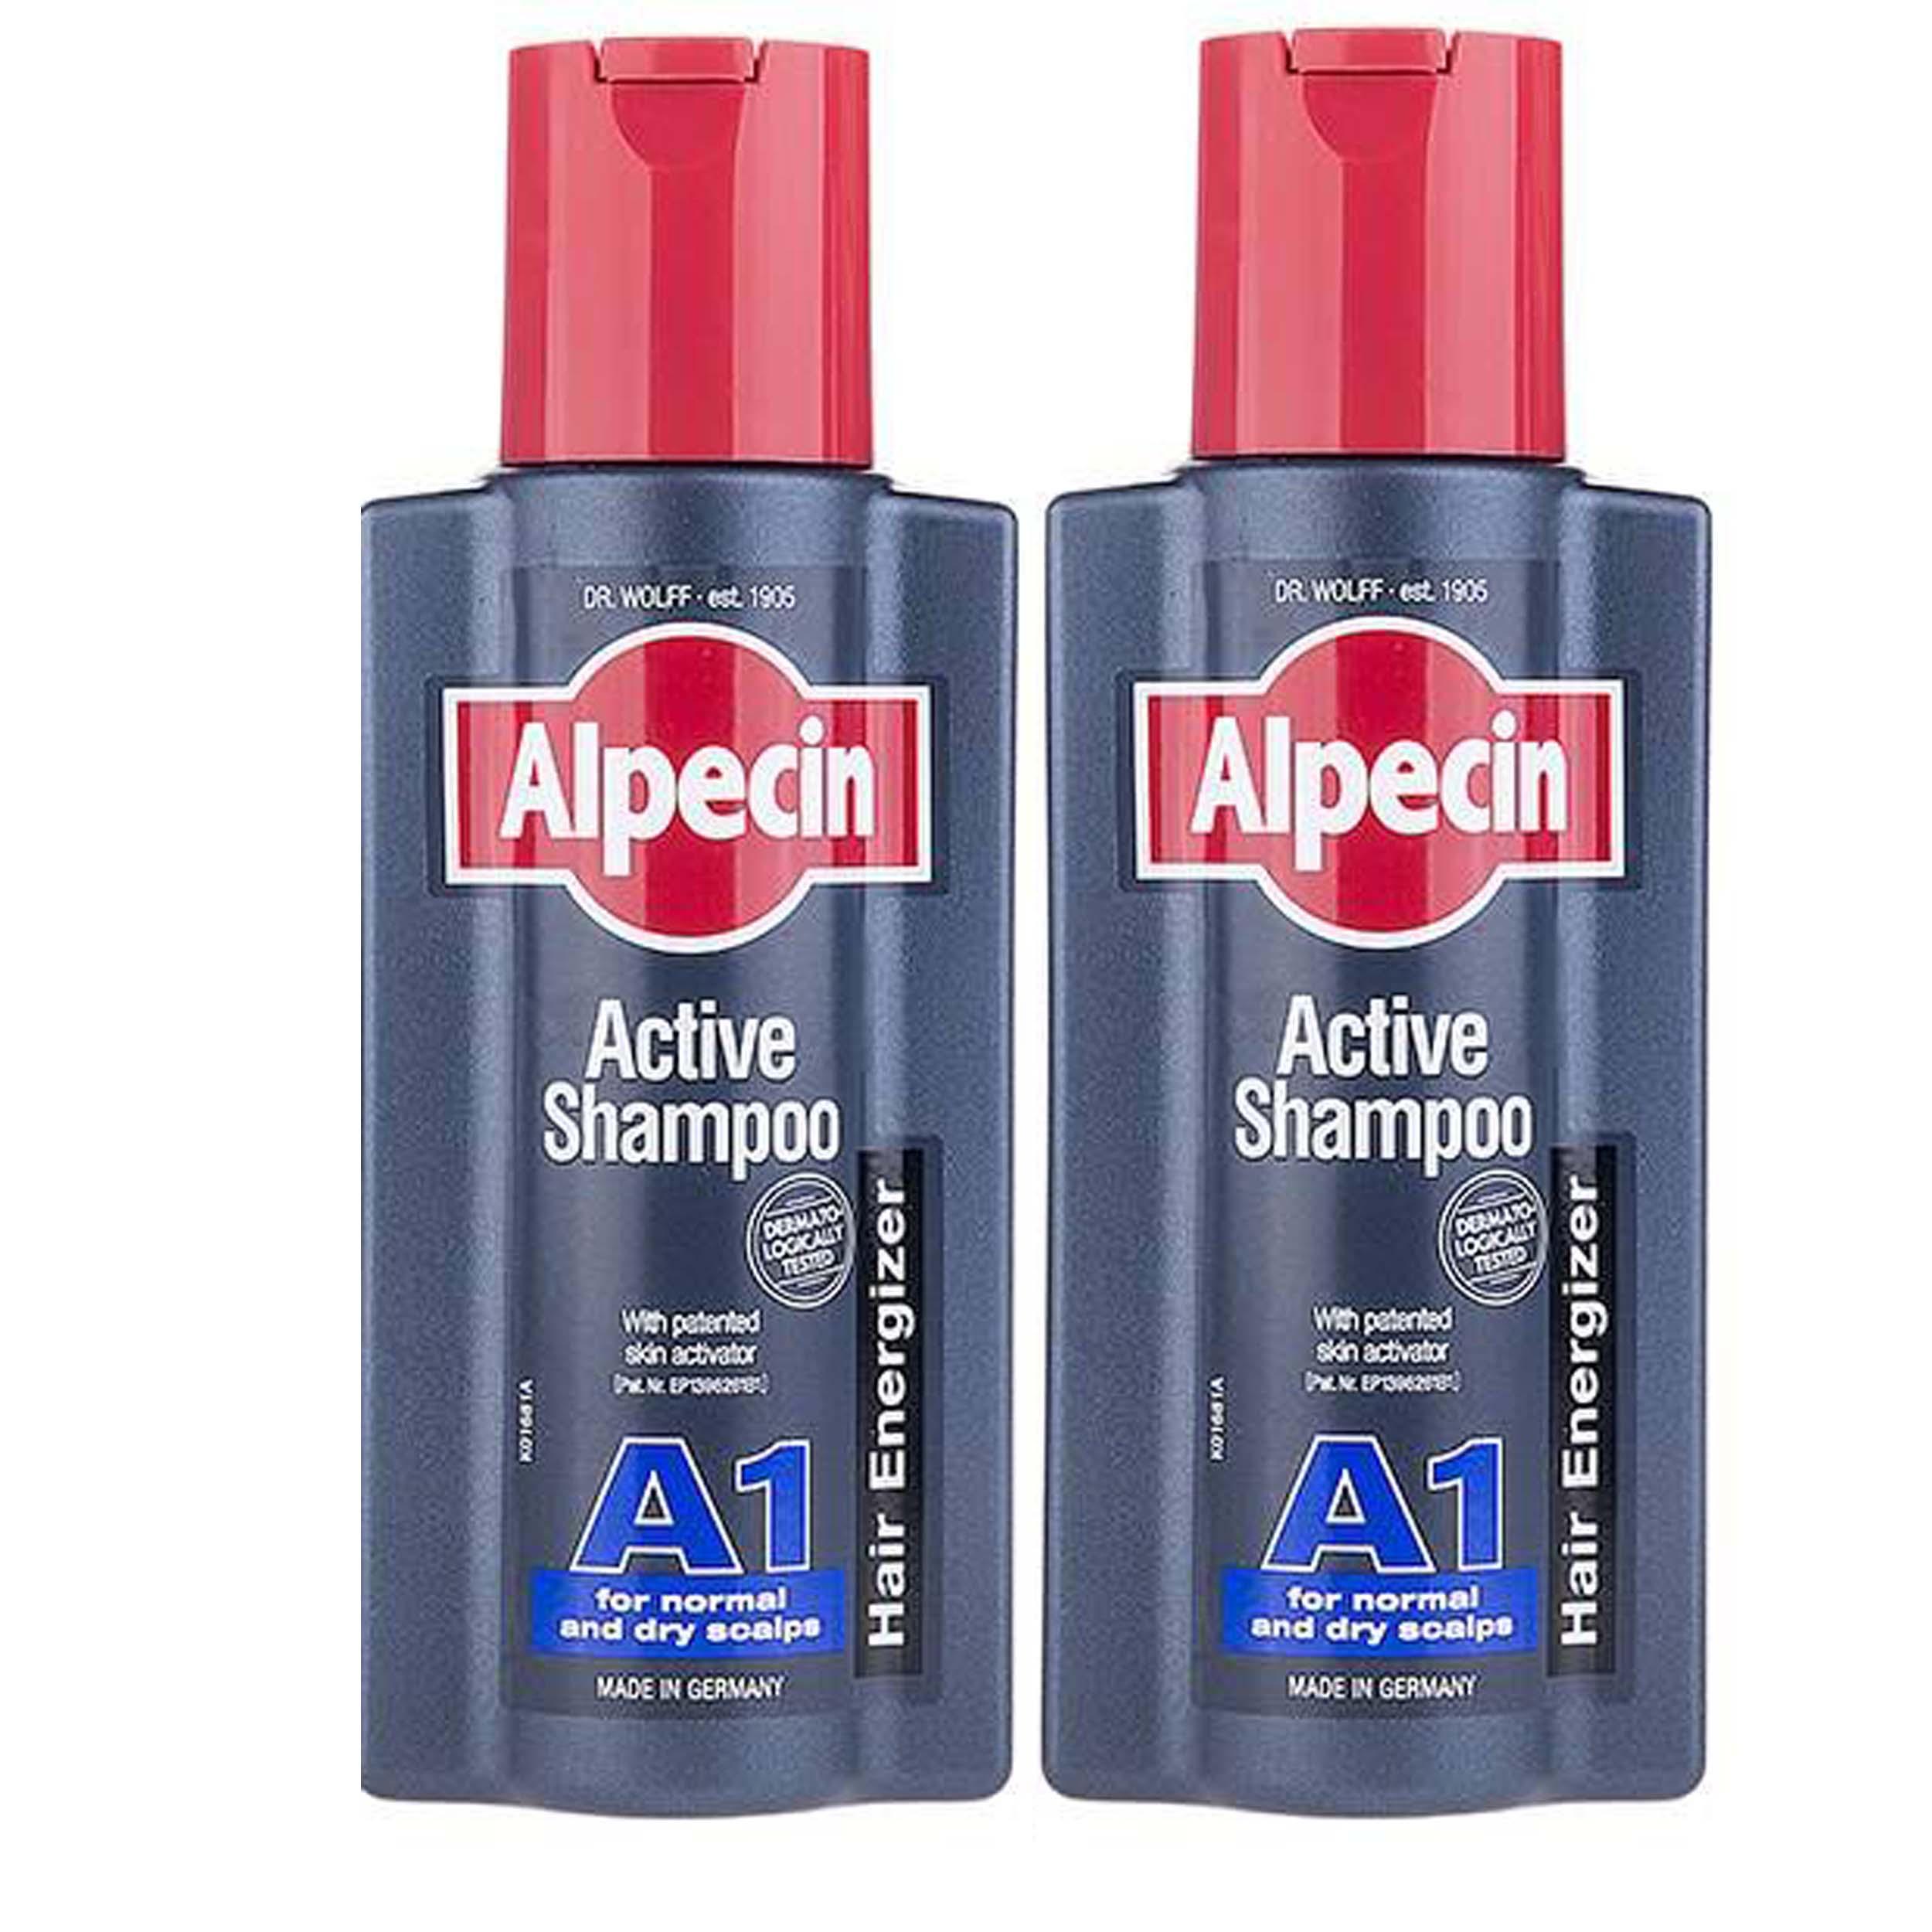 خرید                      شامپو مو آلپسین مدل A1 Active حجم 250 میلی لیتر بسته 2 عددی